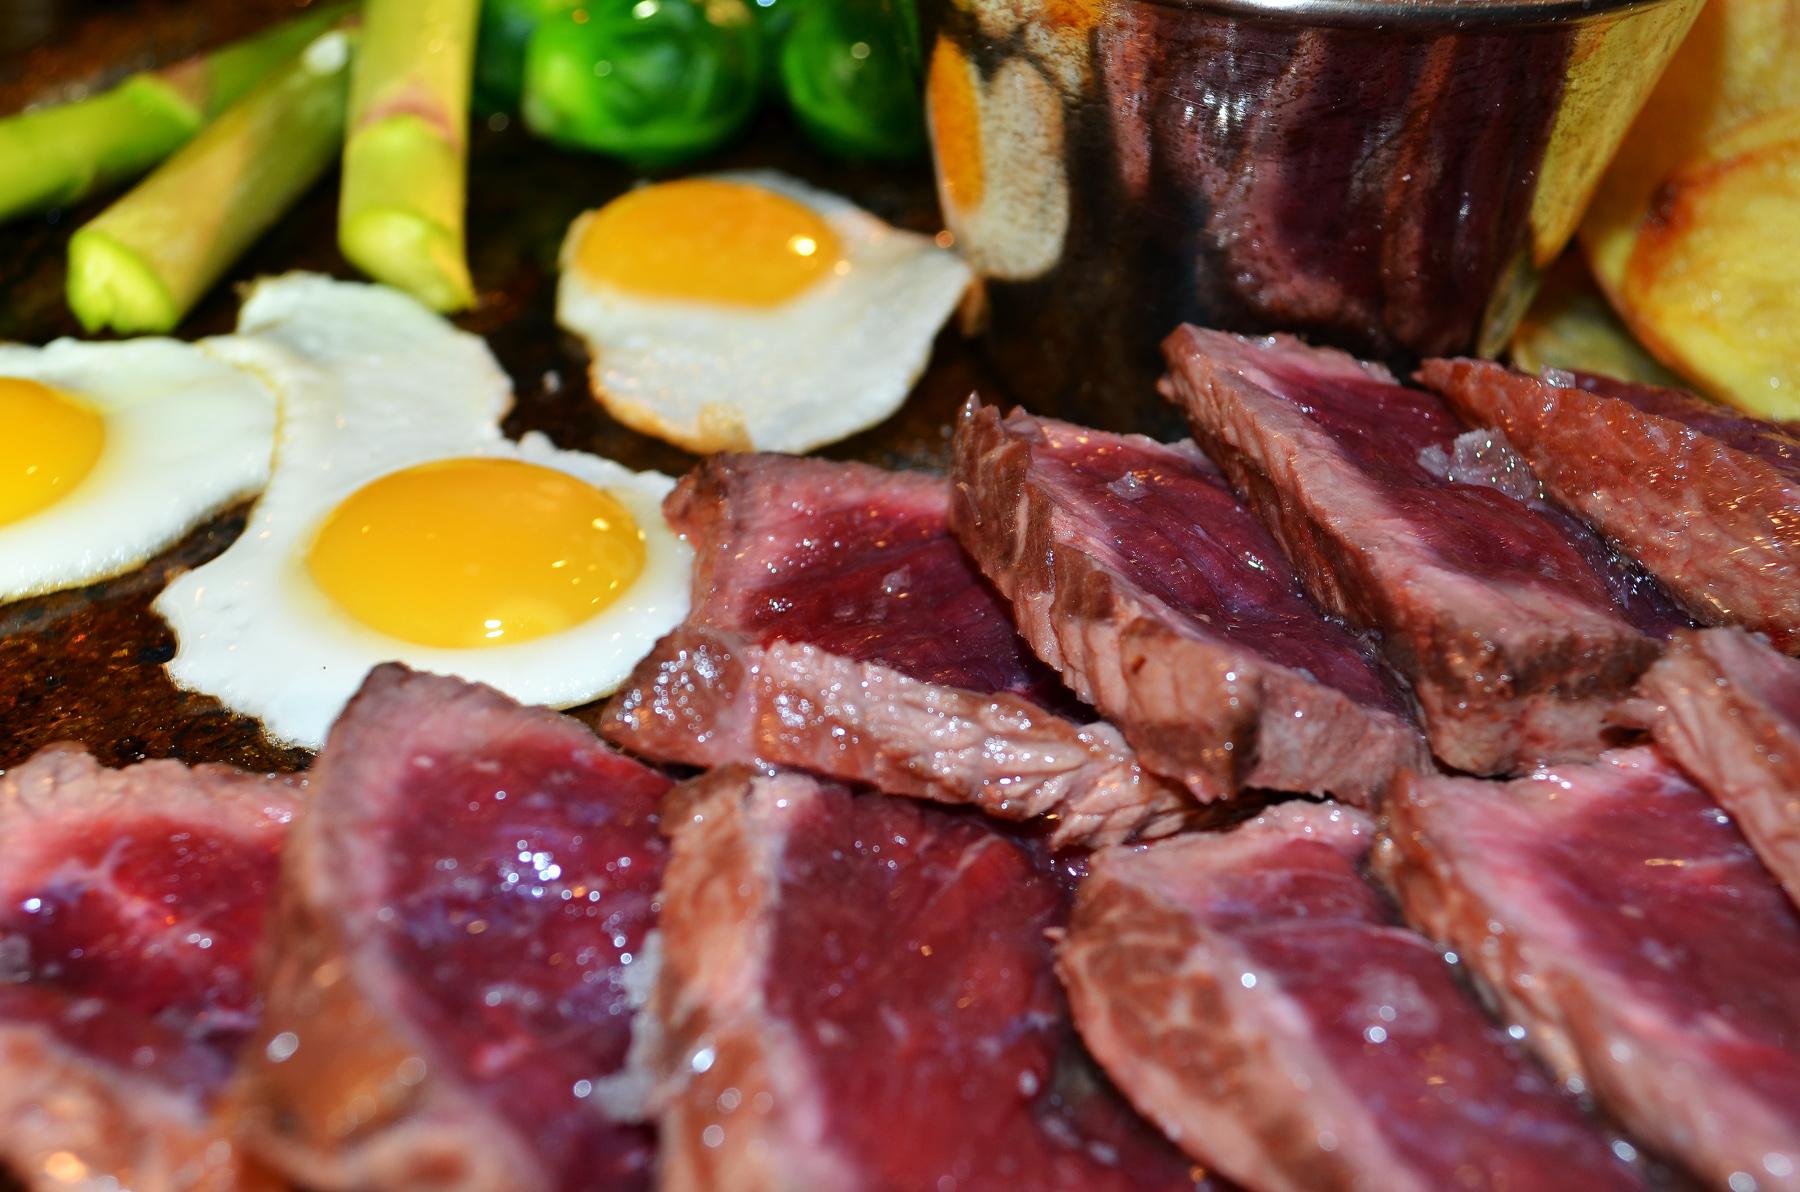 carne en restaurante shakti en albir de espana